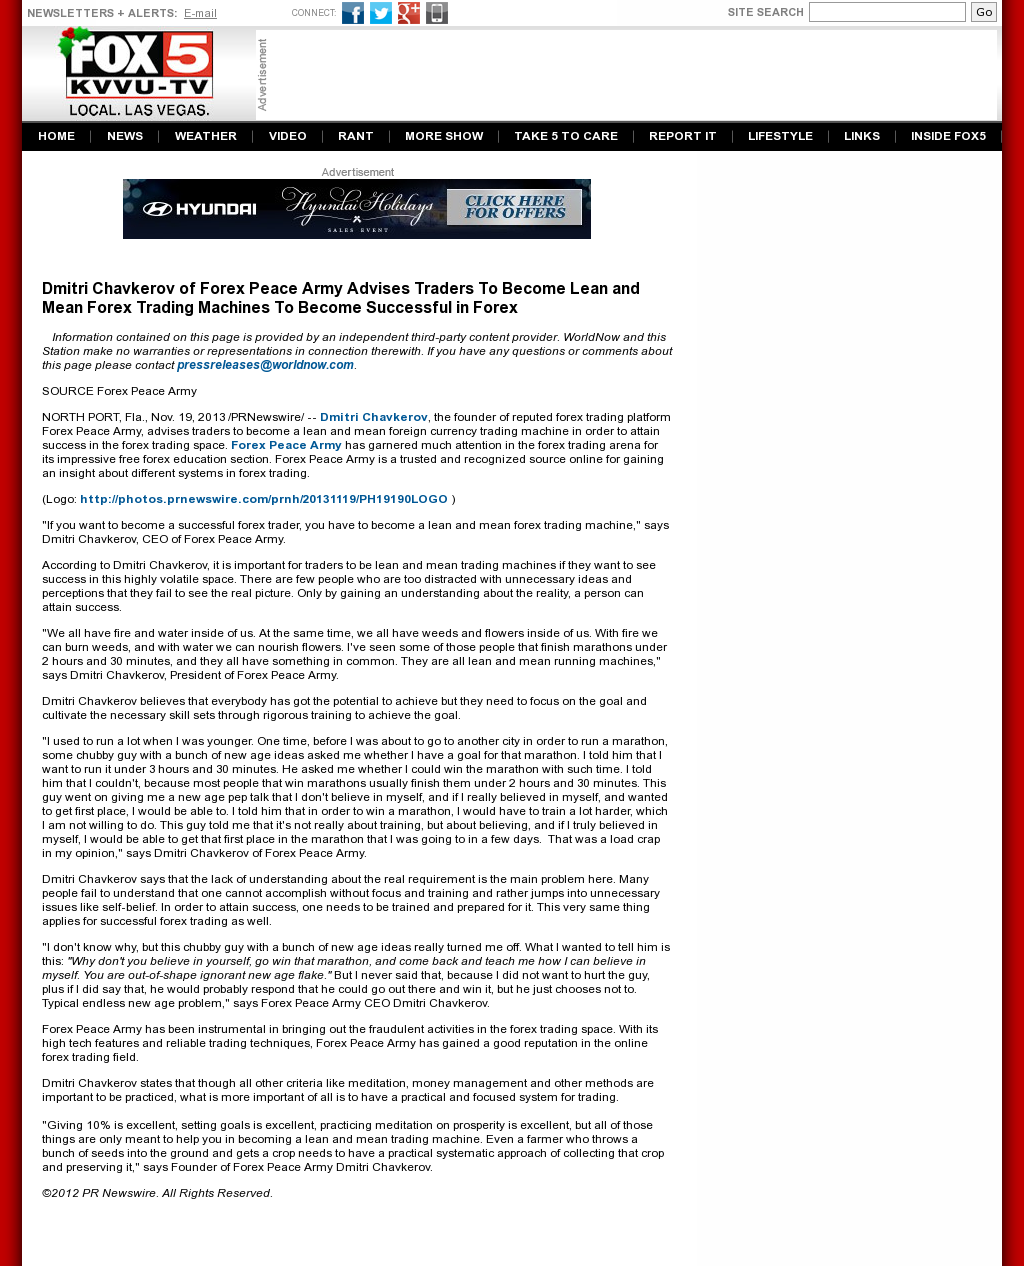 Dmitri Chavkerov - KVVU-TV FOX-5 (Las Vegas, NV) - Lean Forex Trading